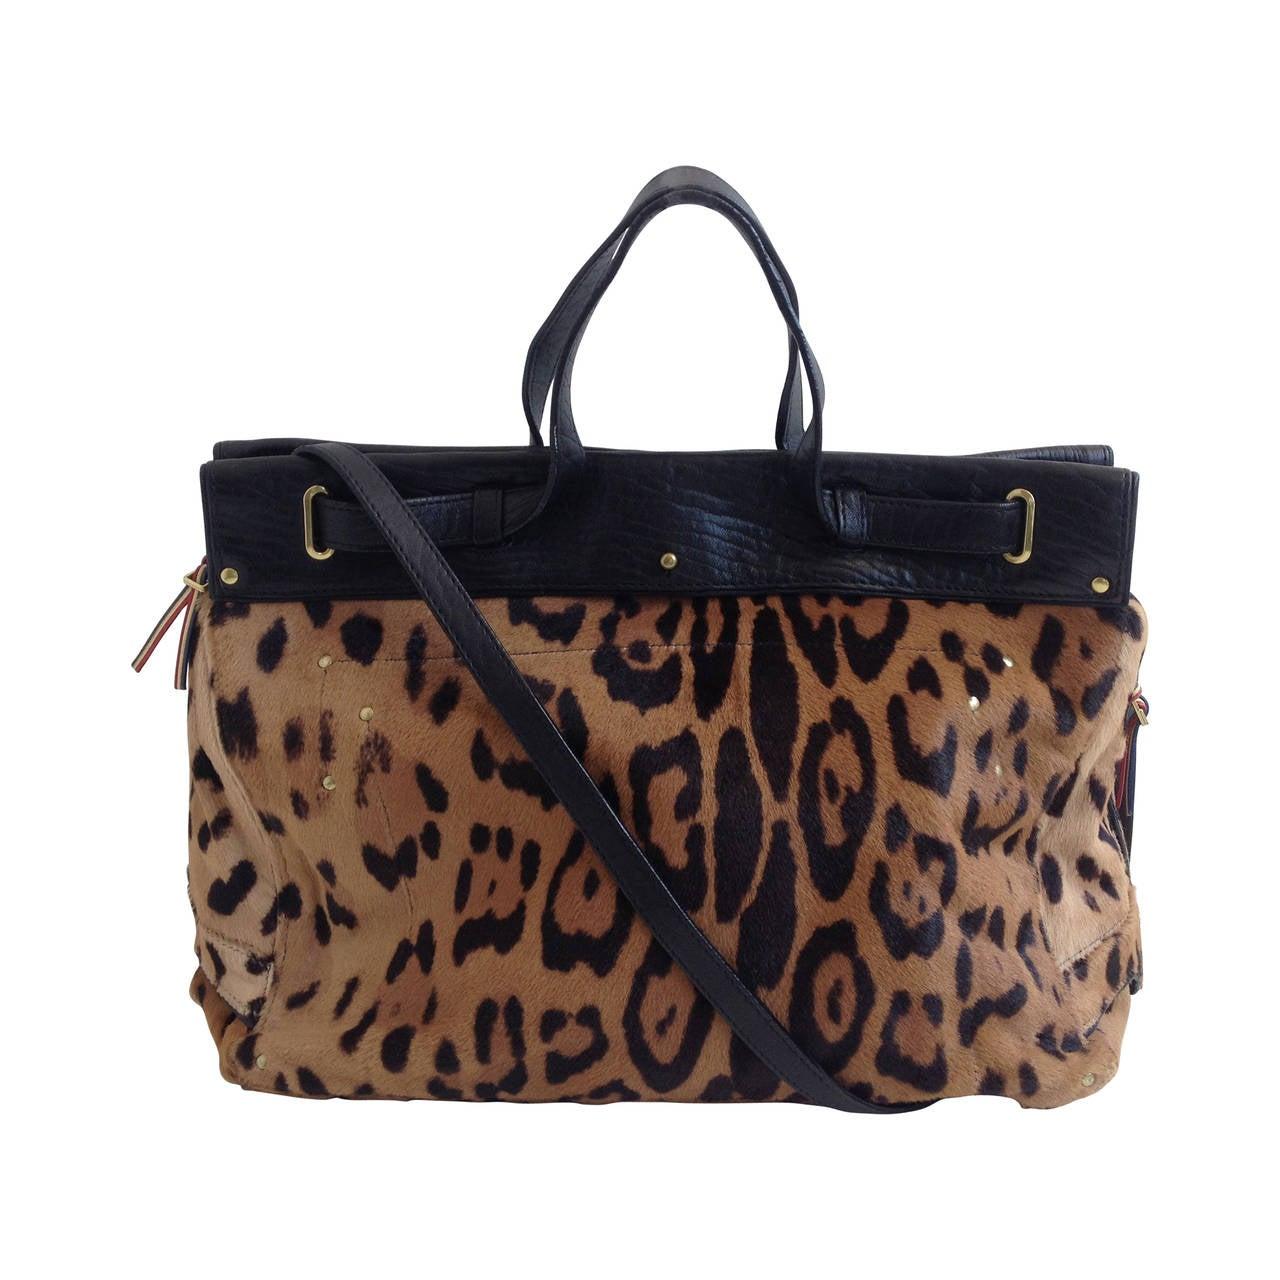 Jerome Dreyfuss Brown Leopard Pony Hair Carlos Handbag At